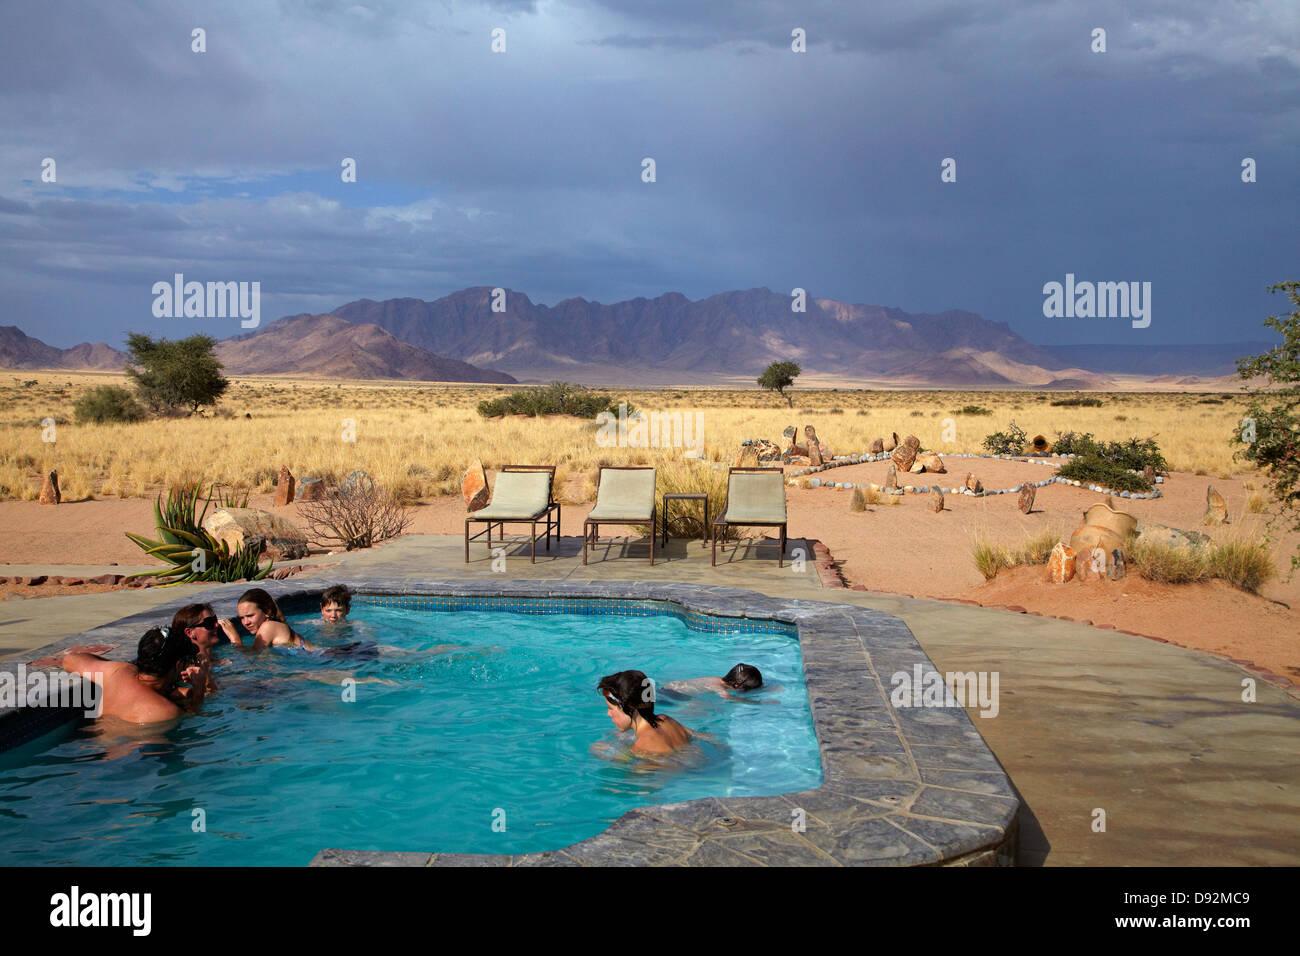 Piscine du Desert Camp, Sesriem, Désert du Namib, Namibie, Afrique Photo Stock